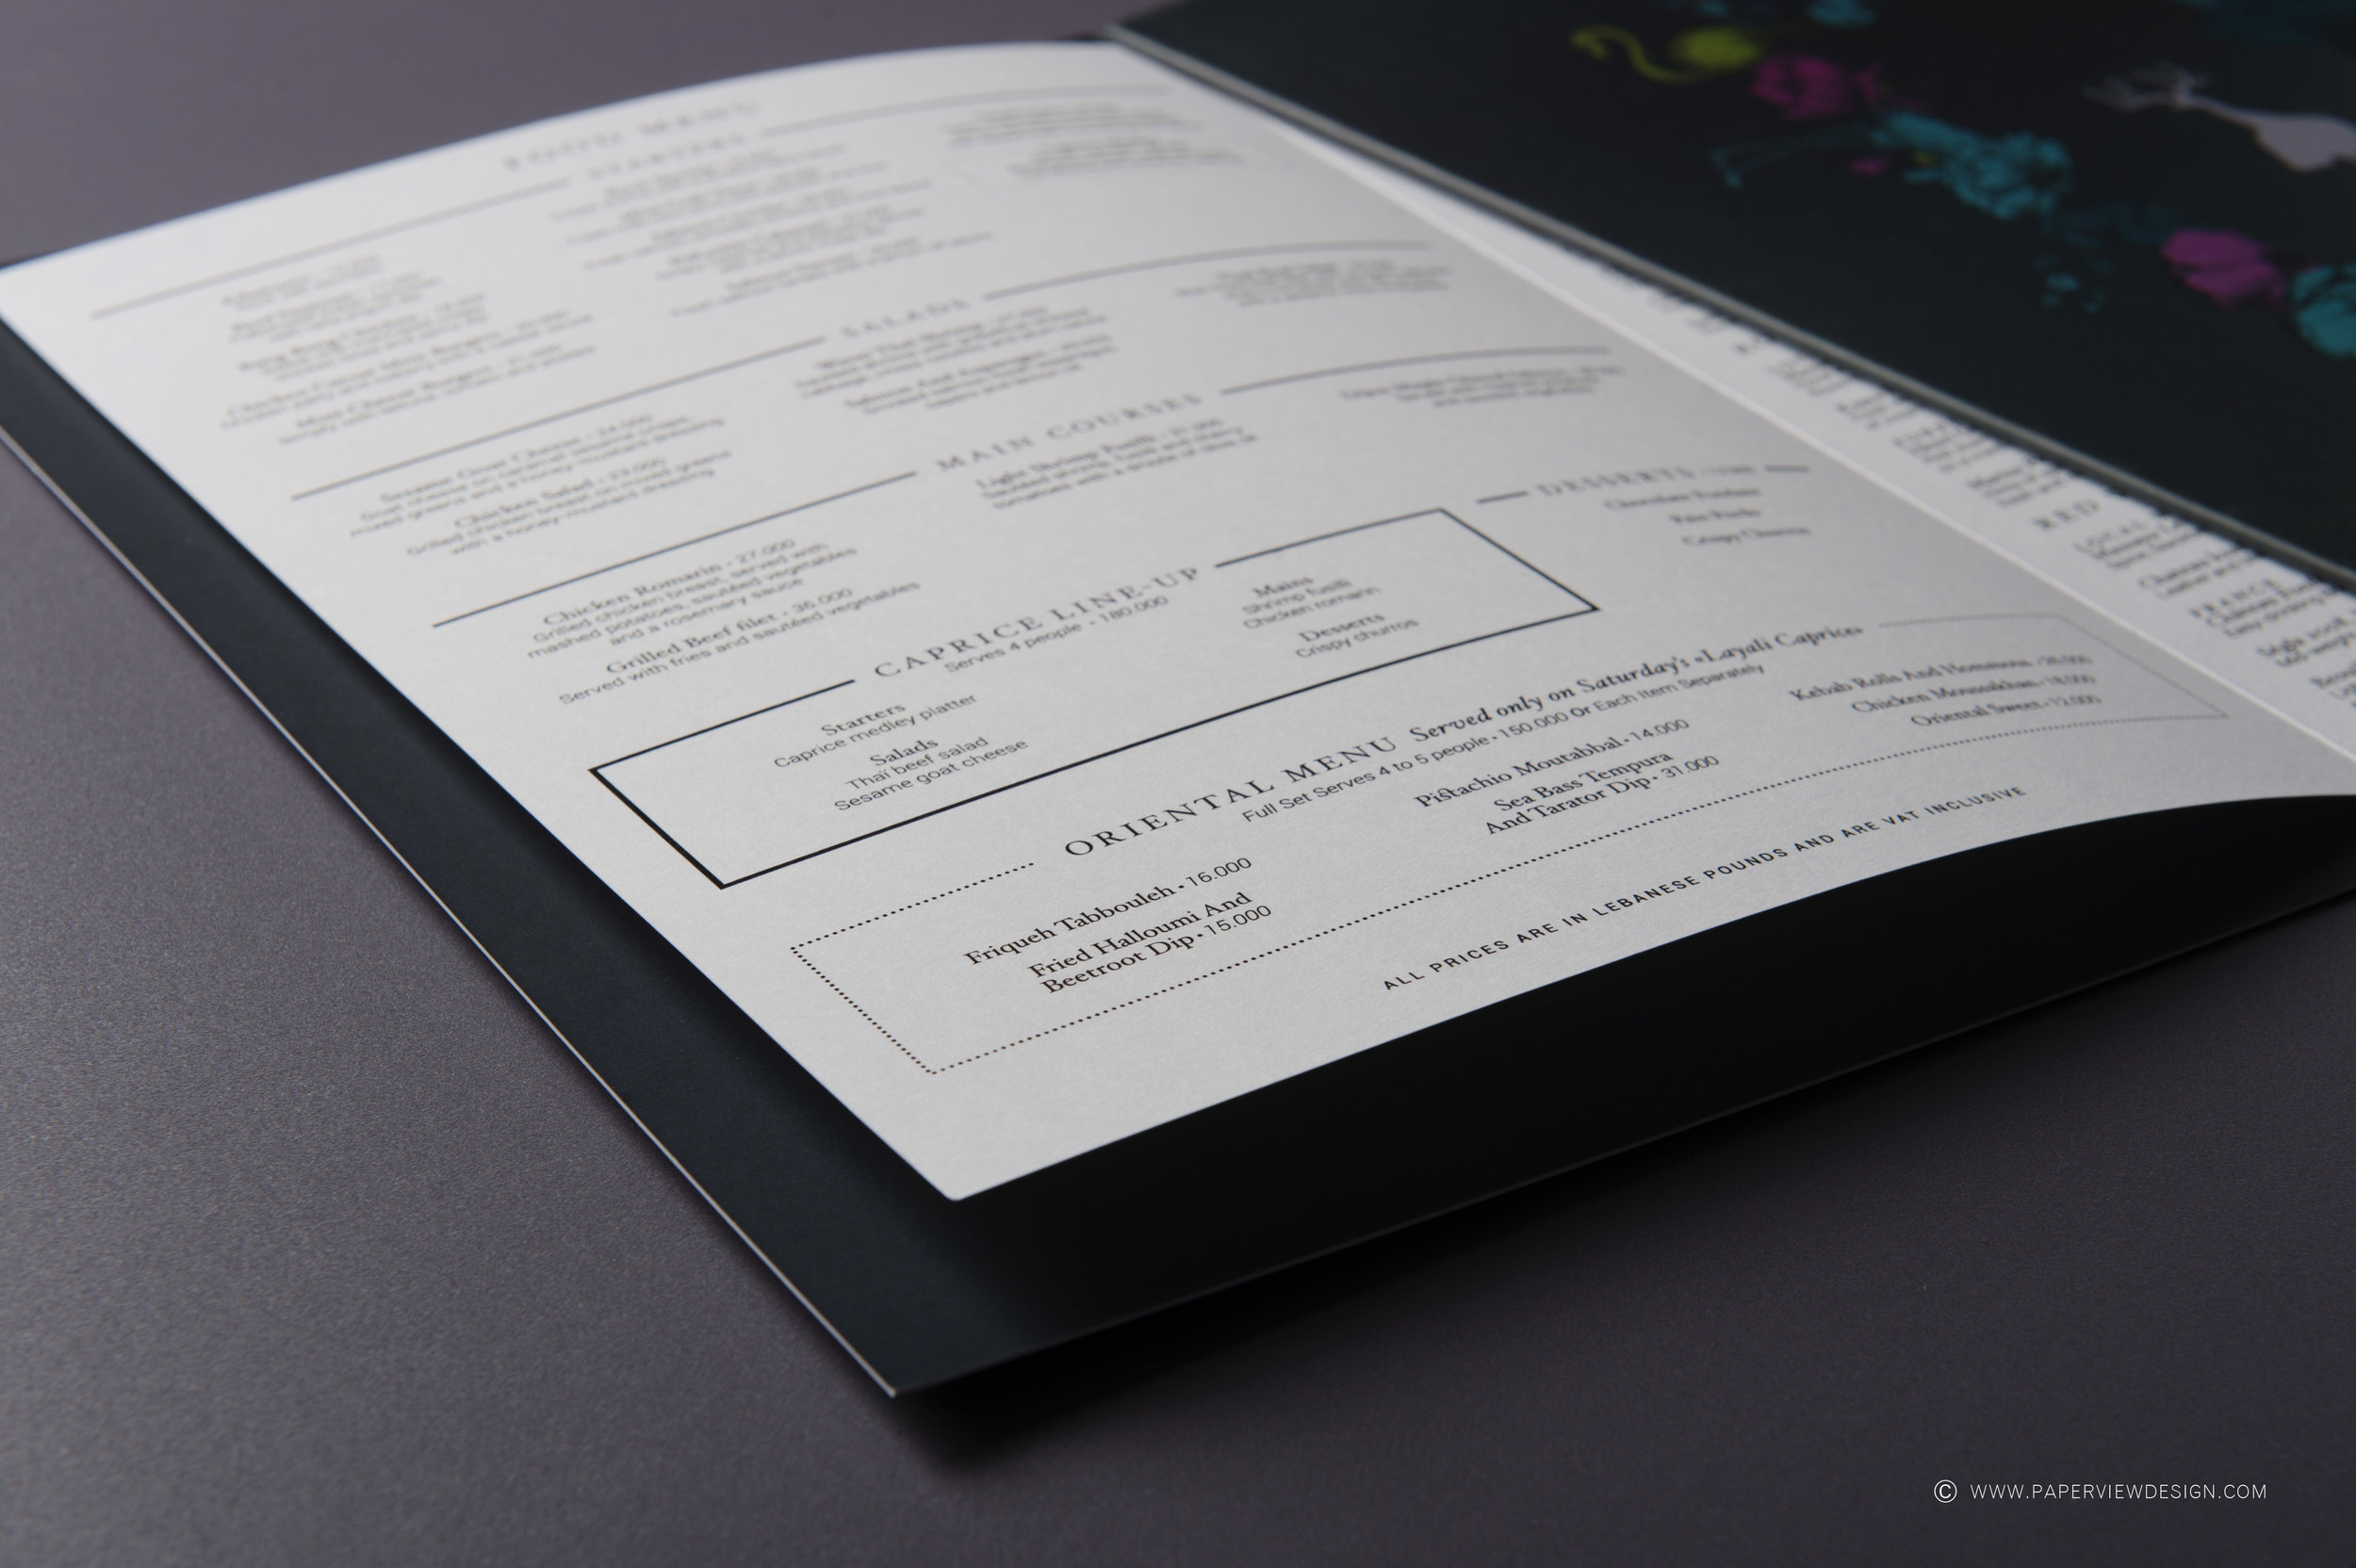 Menu-Oriental-Inside-Sheets-Restaurant-Paper-Textures